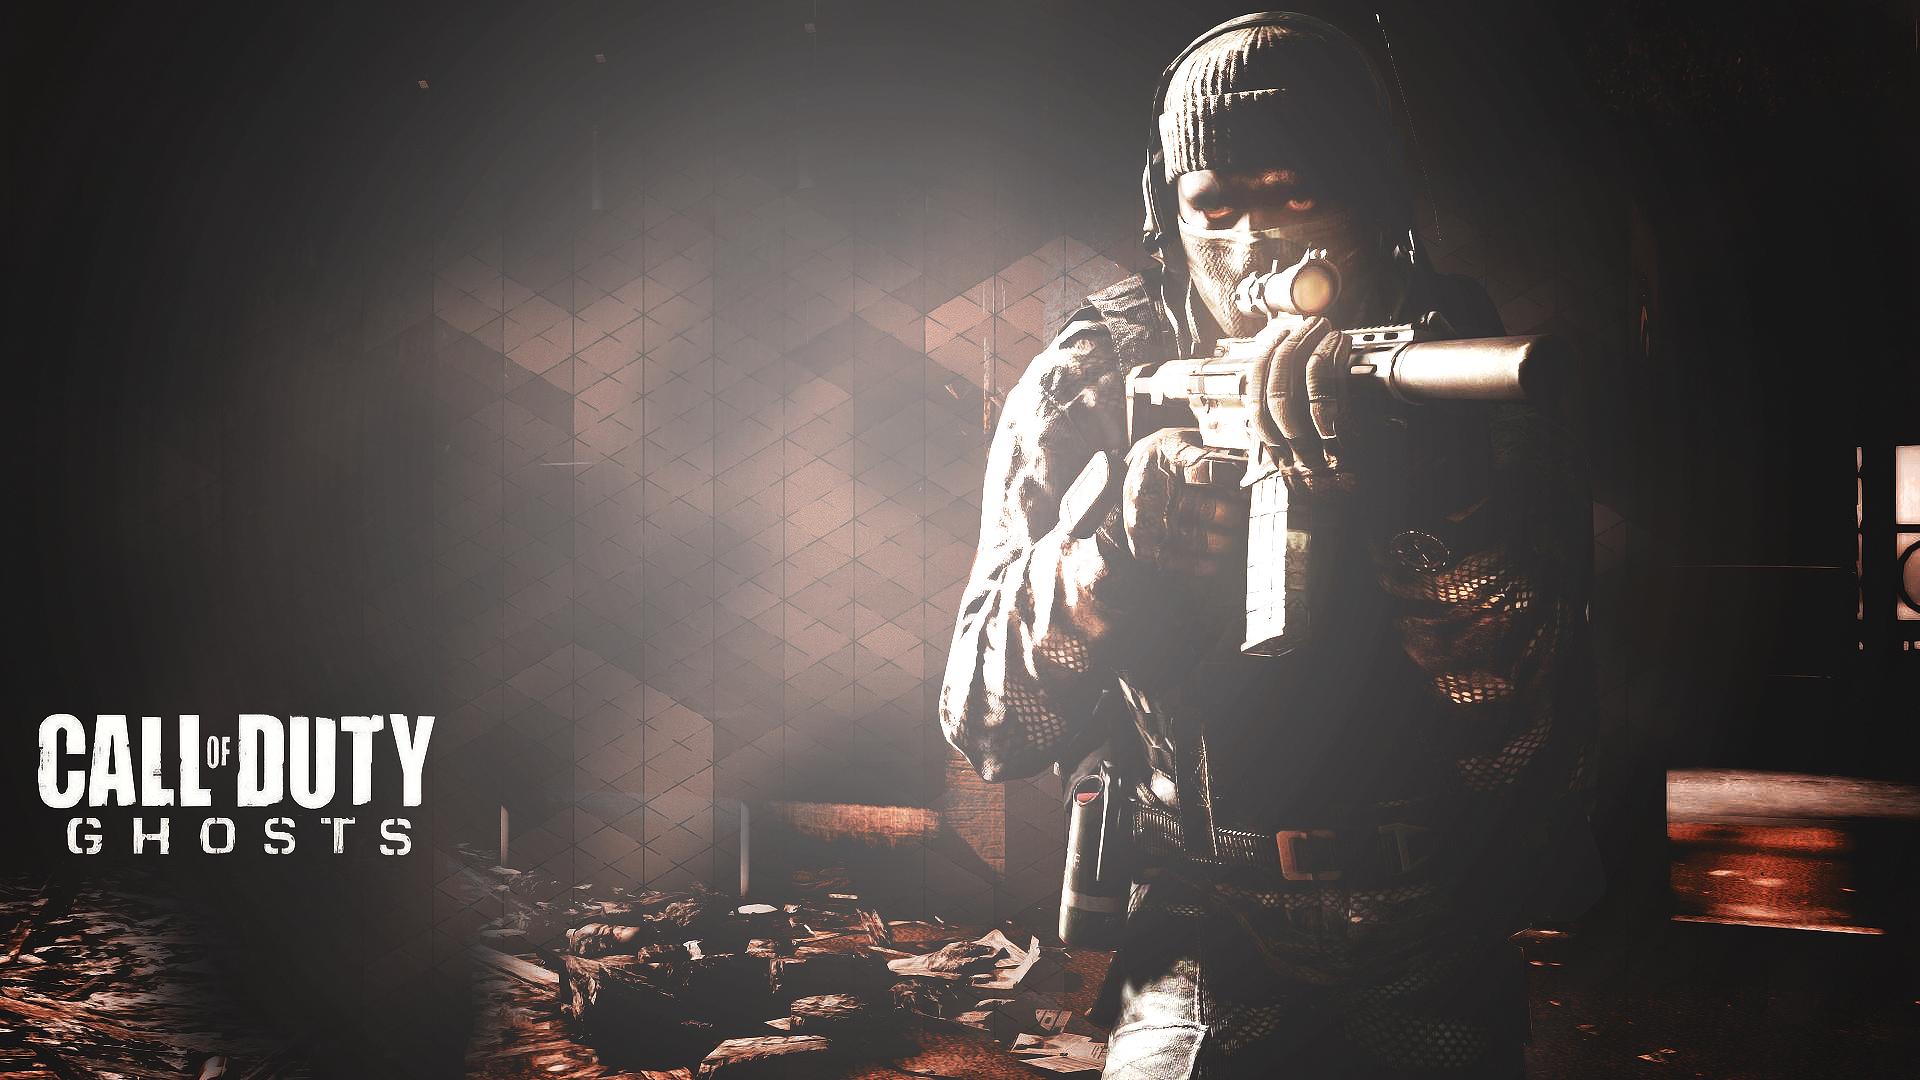 Call Of Duty Ghosts By Zhiken On Deviantart